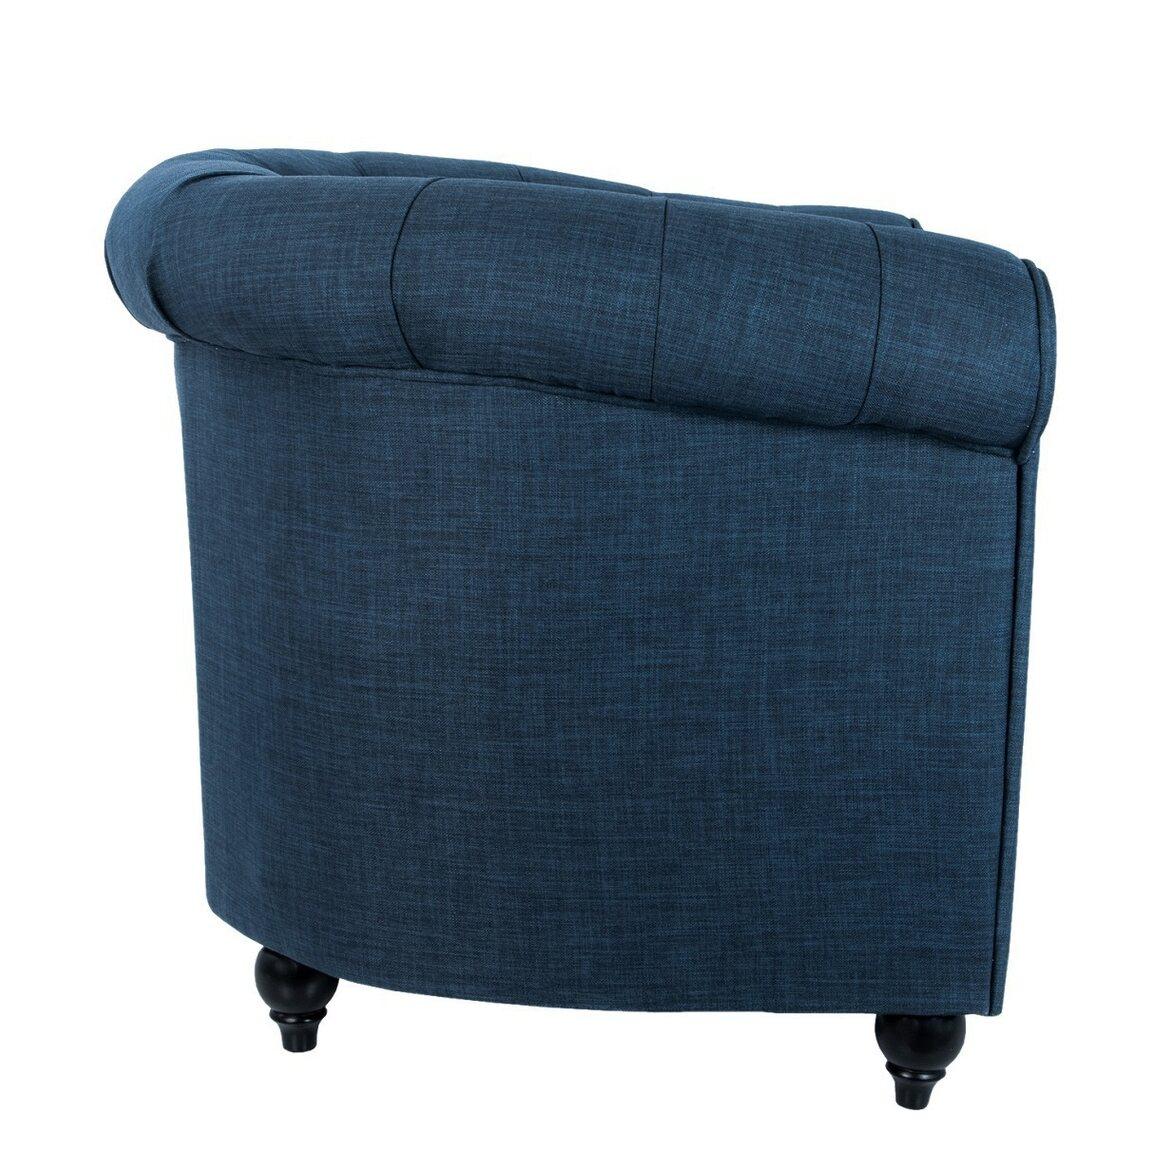 Кресло Nala blue 2 | Каминные кресла Kingsby